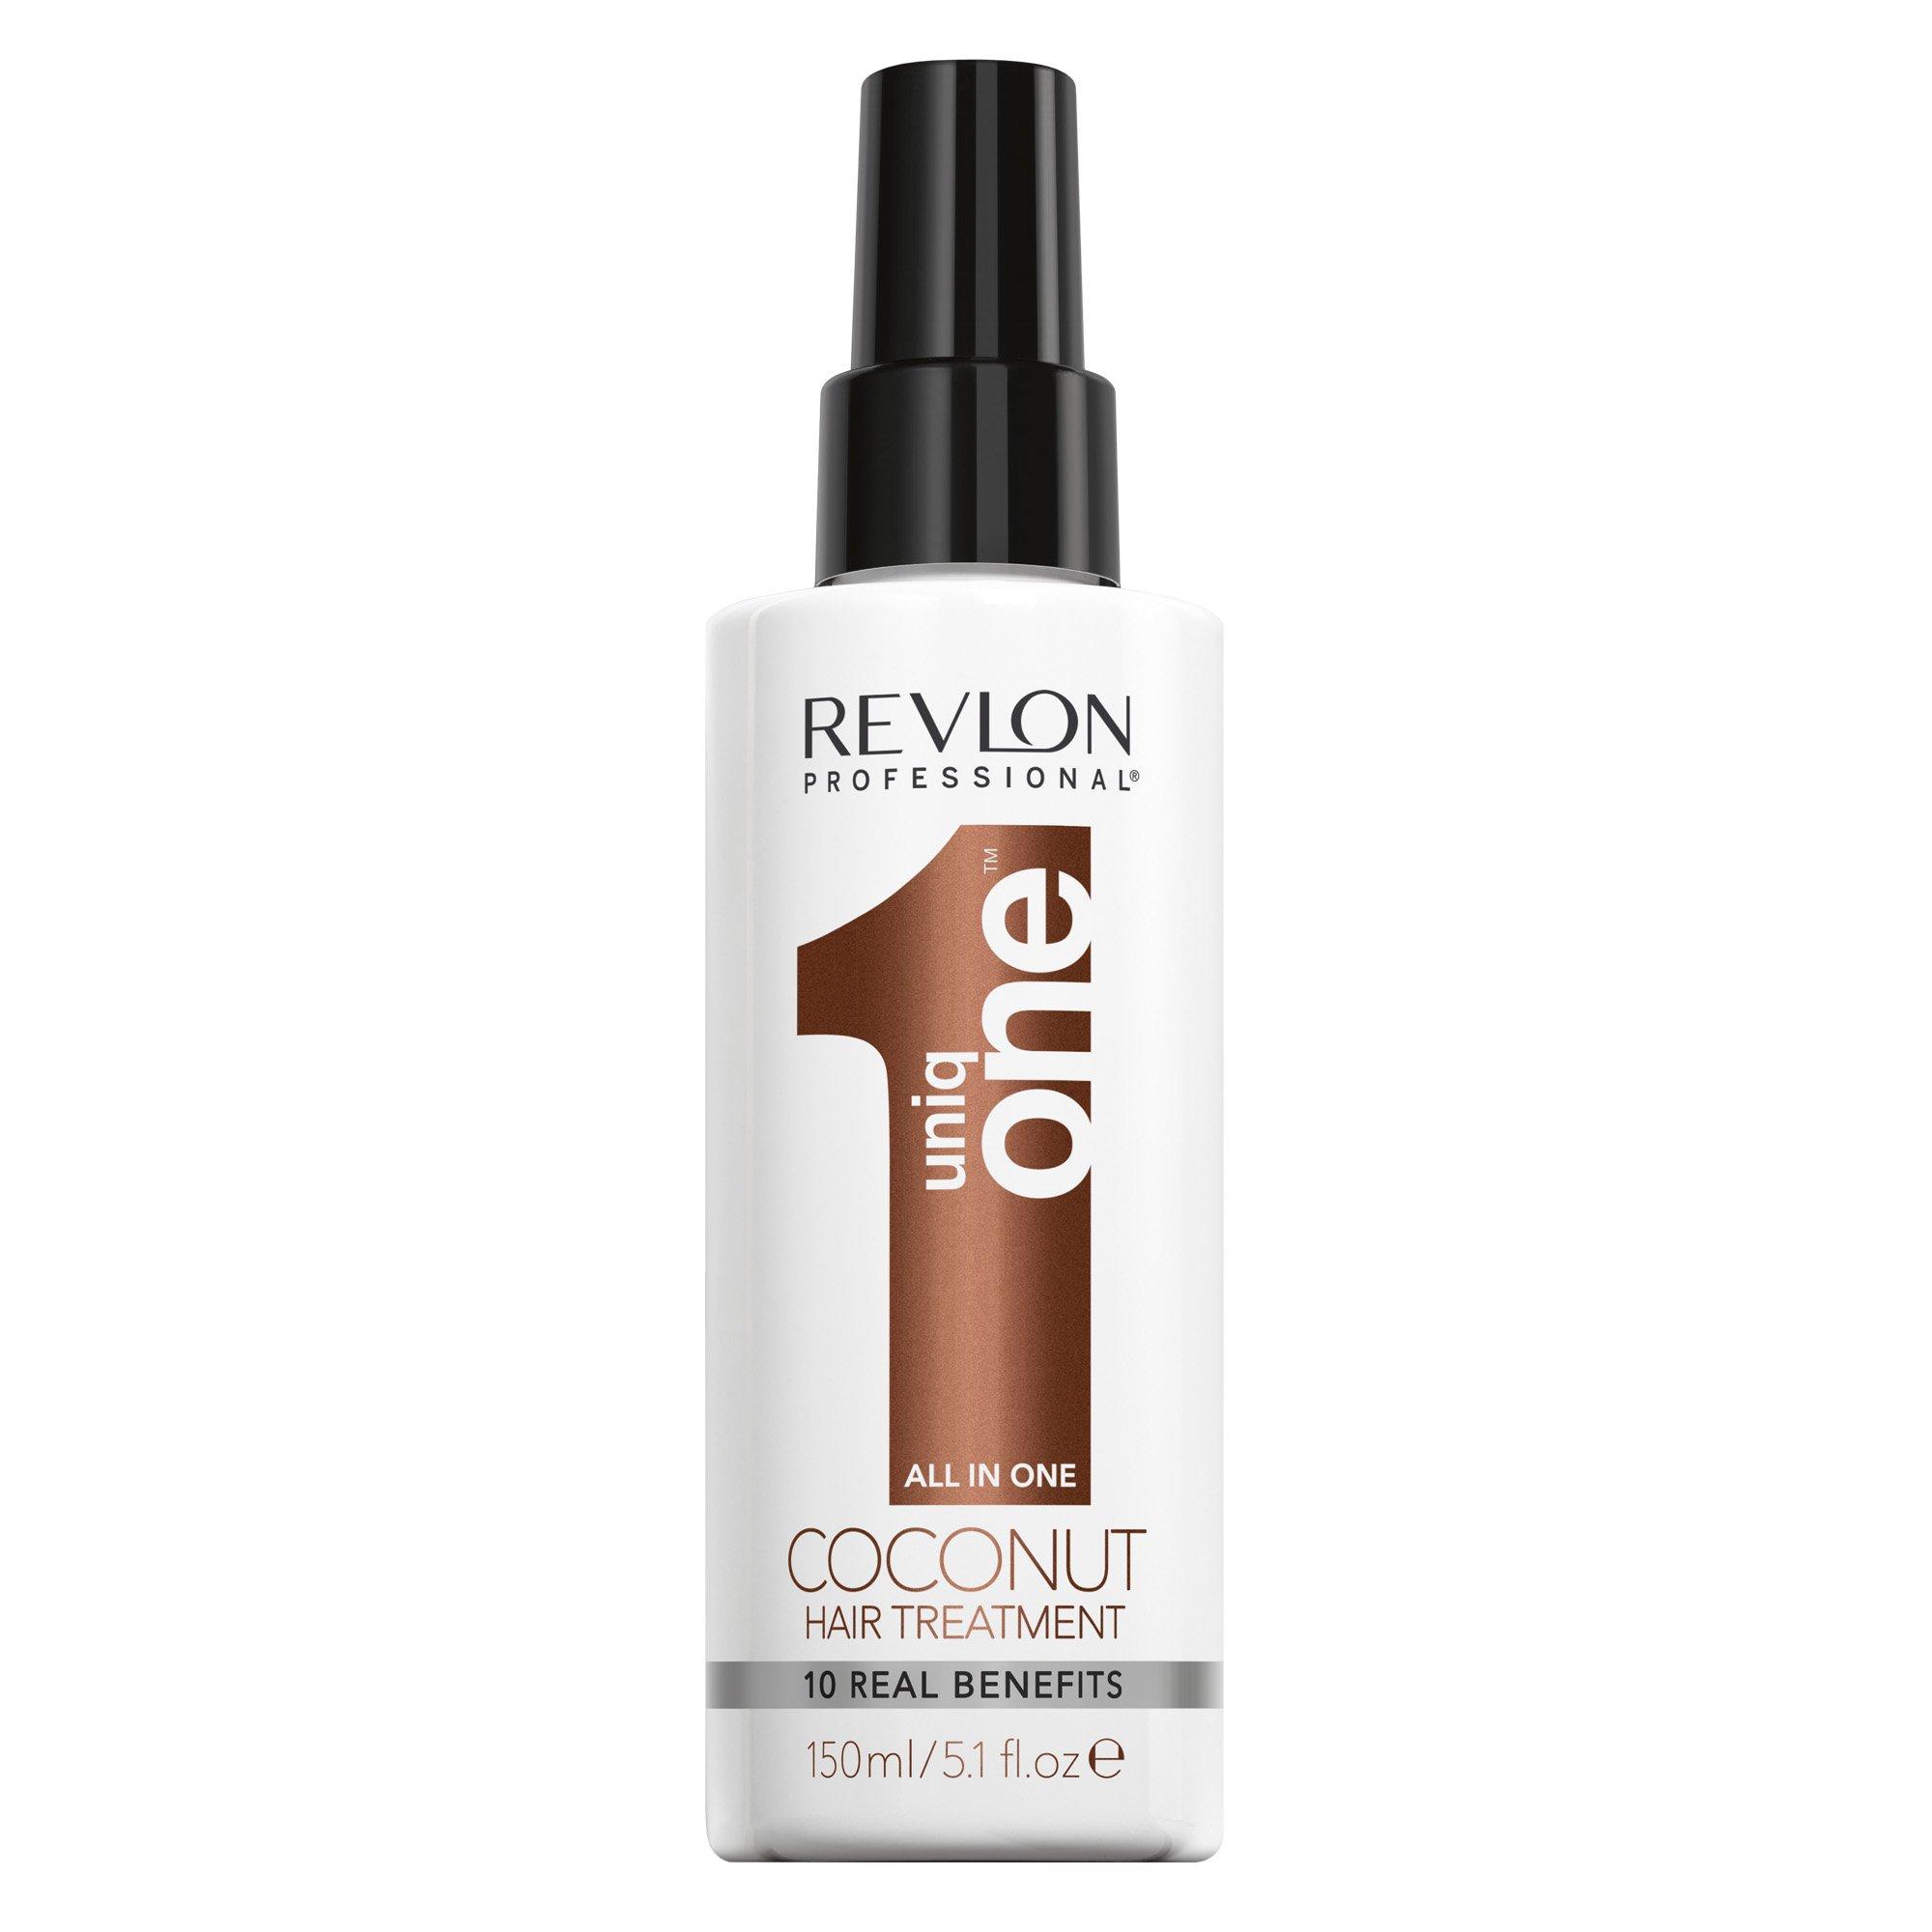 REVLON PROFESSIONAL Uniq One Coconut Hair Treatment 150ml product image